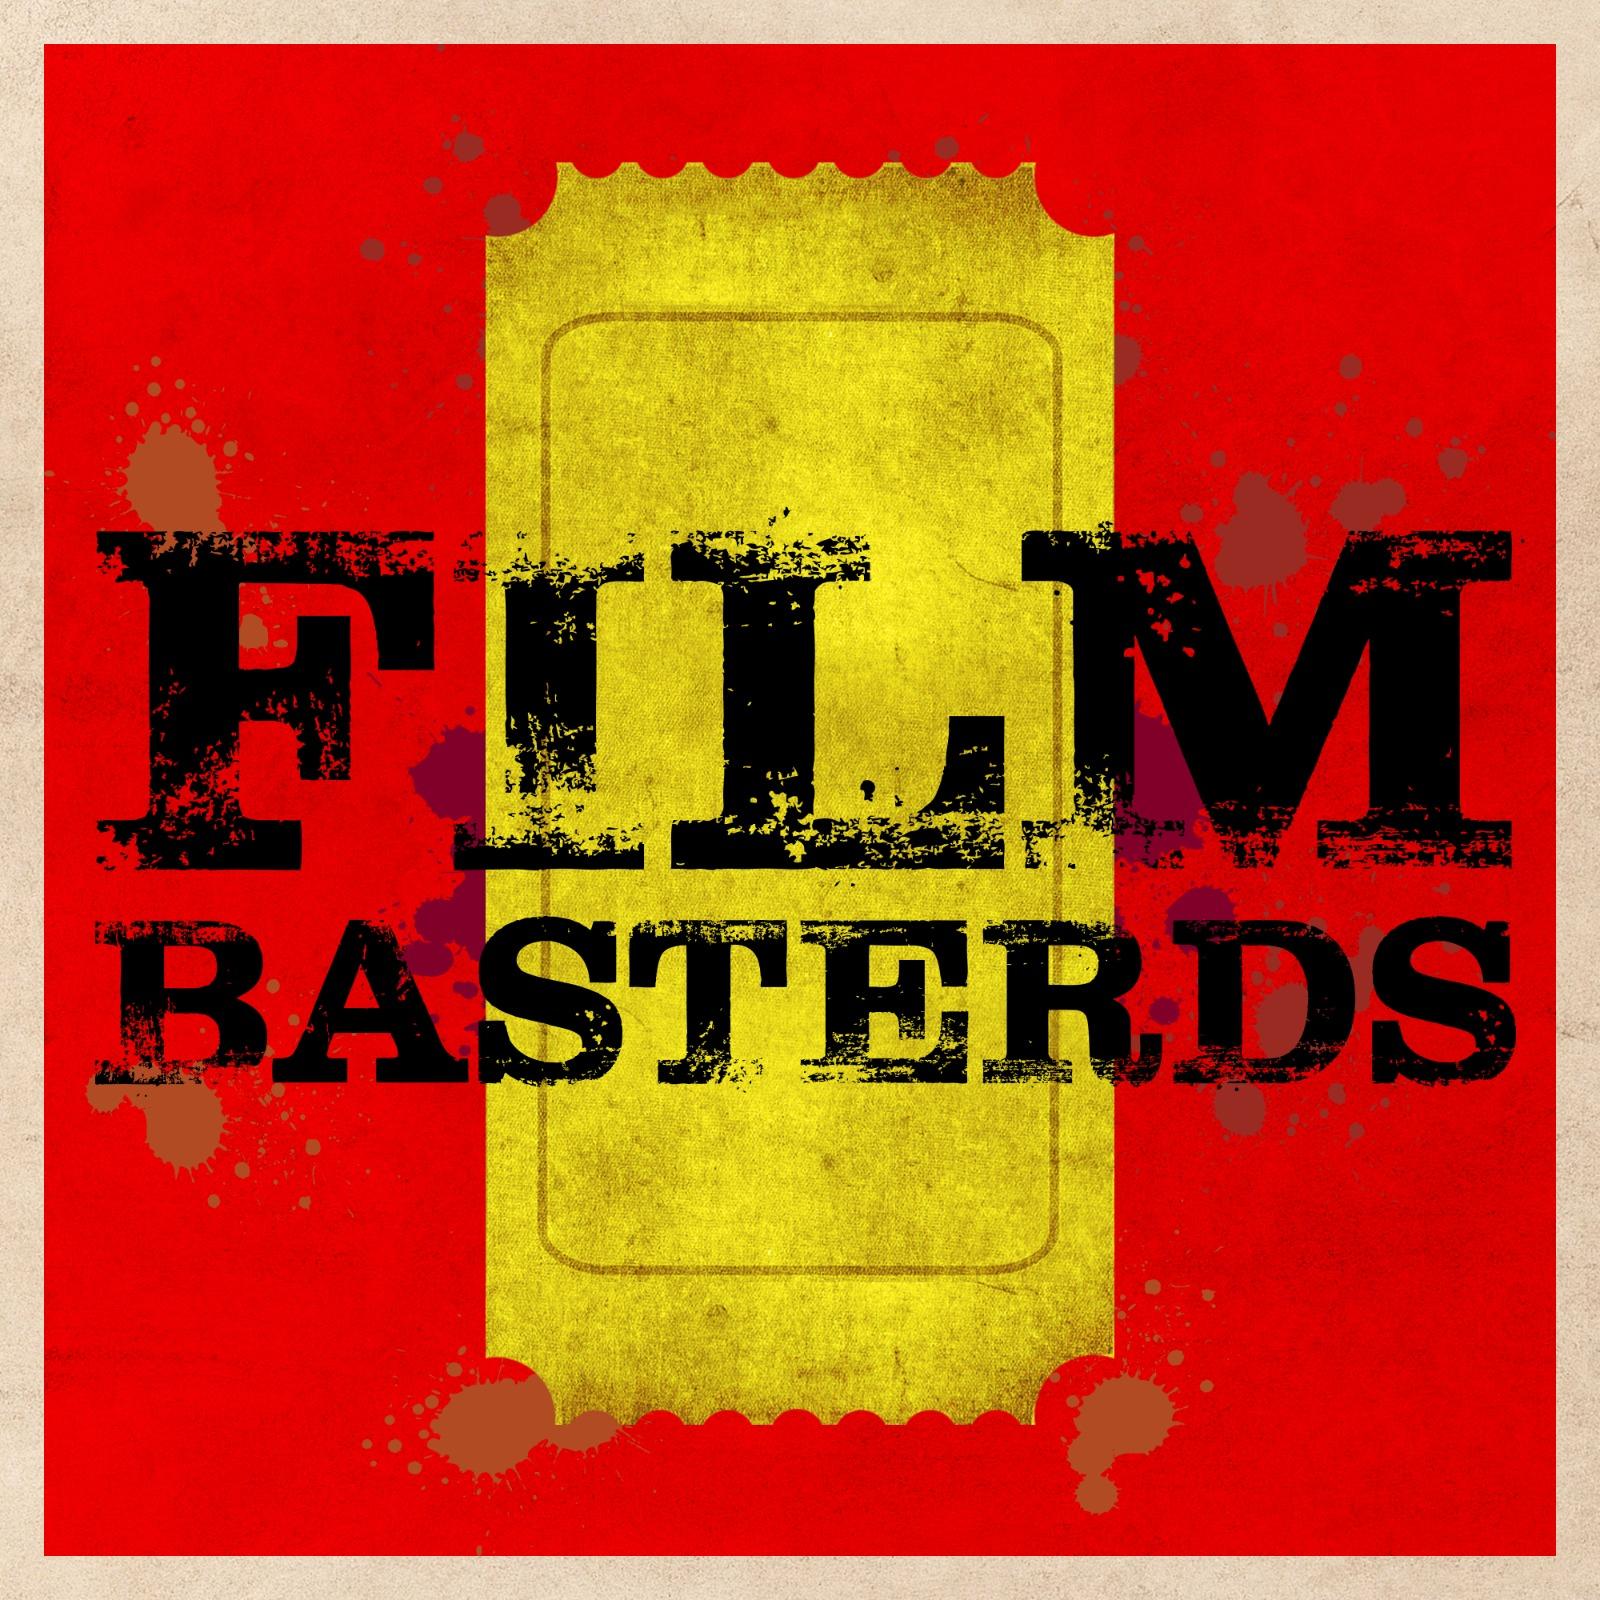 Film Basterds show art